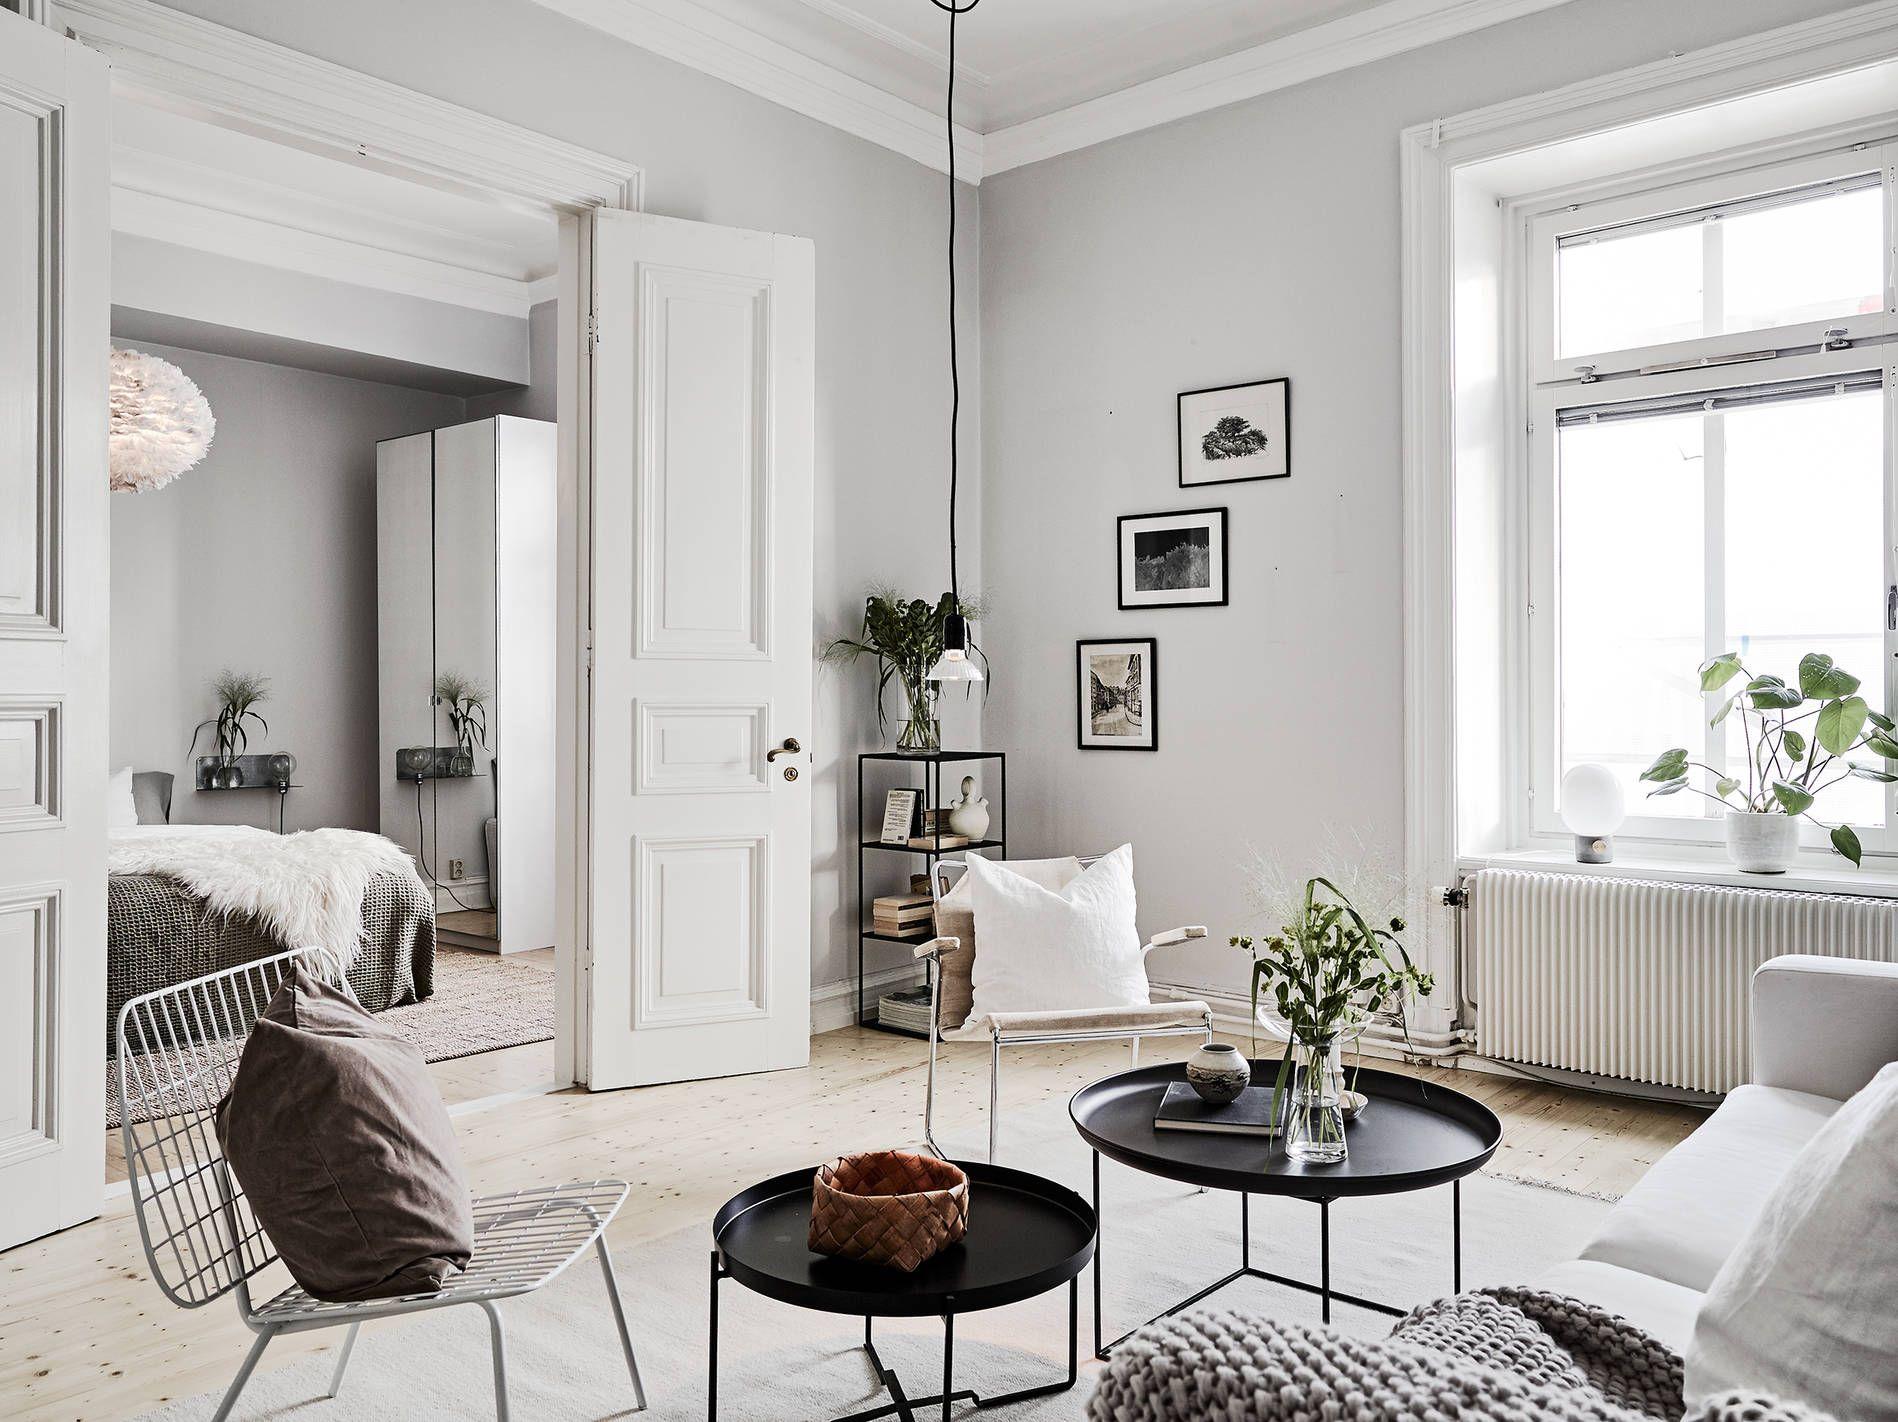 30 Stunning Scandinavian Design Interiors | Open plan, Apartments ...